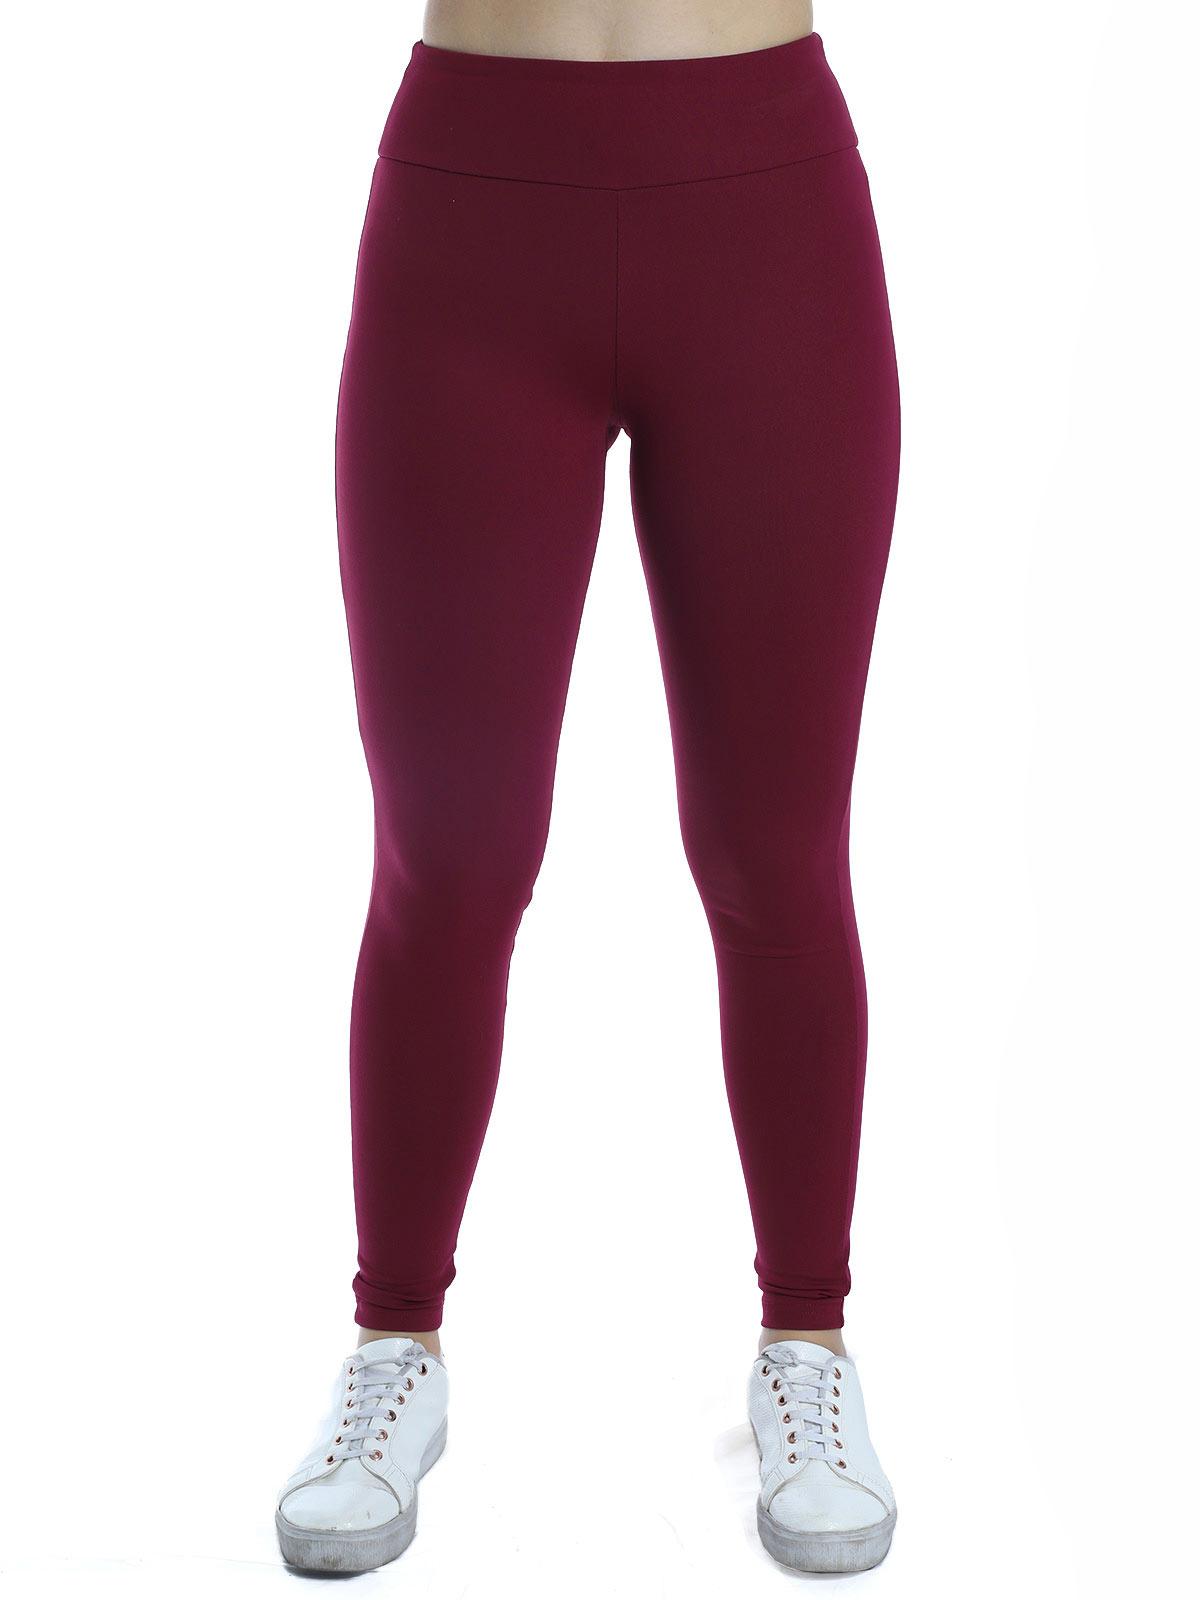 Calça Legging Feminina Cós Anatômico Fitness Academia Bordo